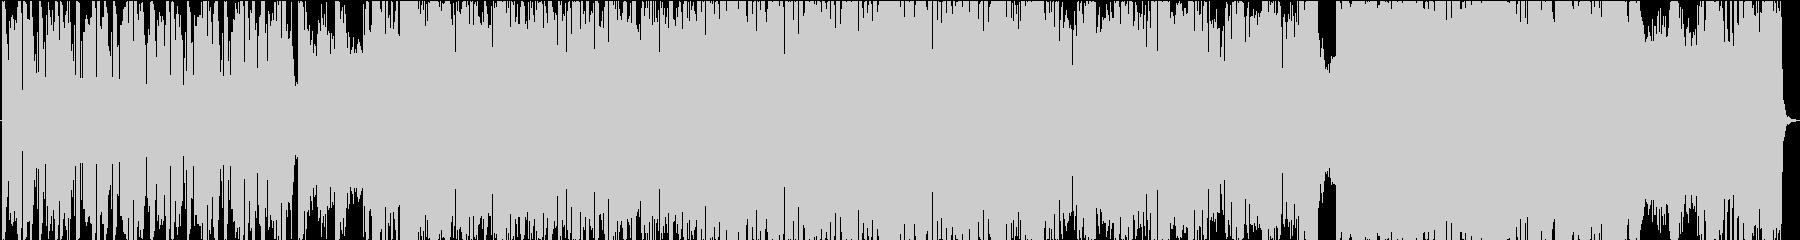 BGM用途のインストEDMの未再生の波形